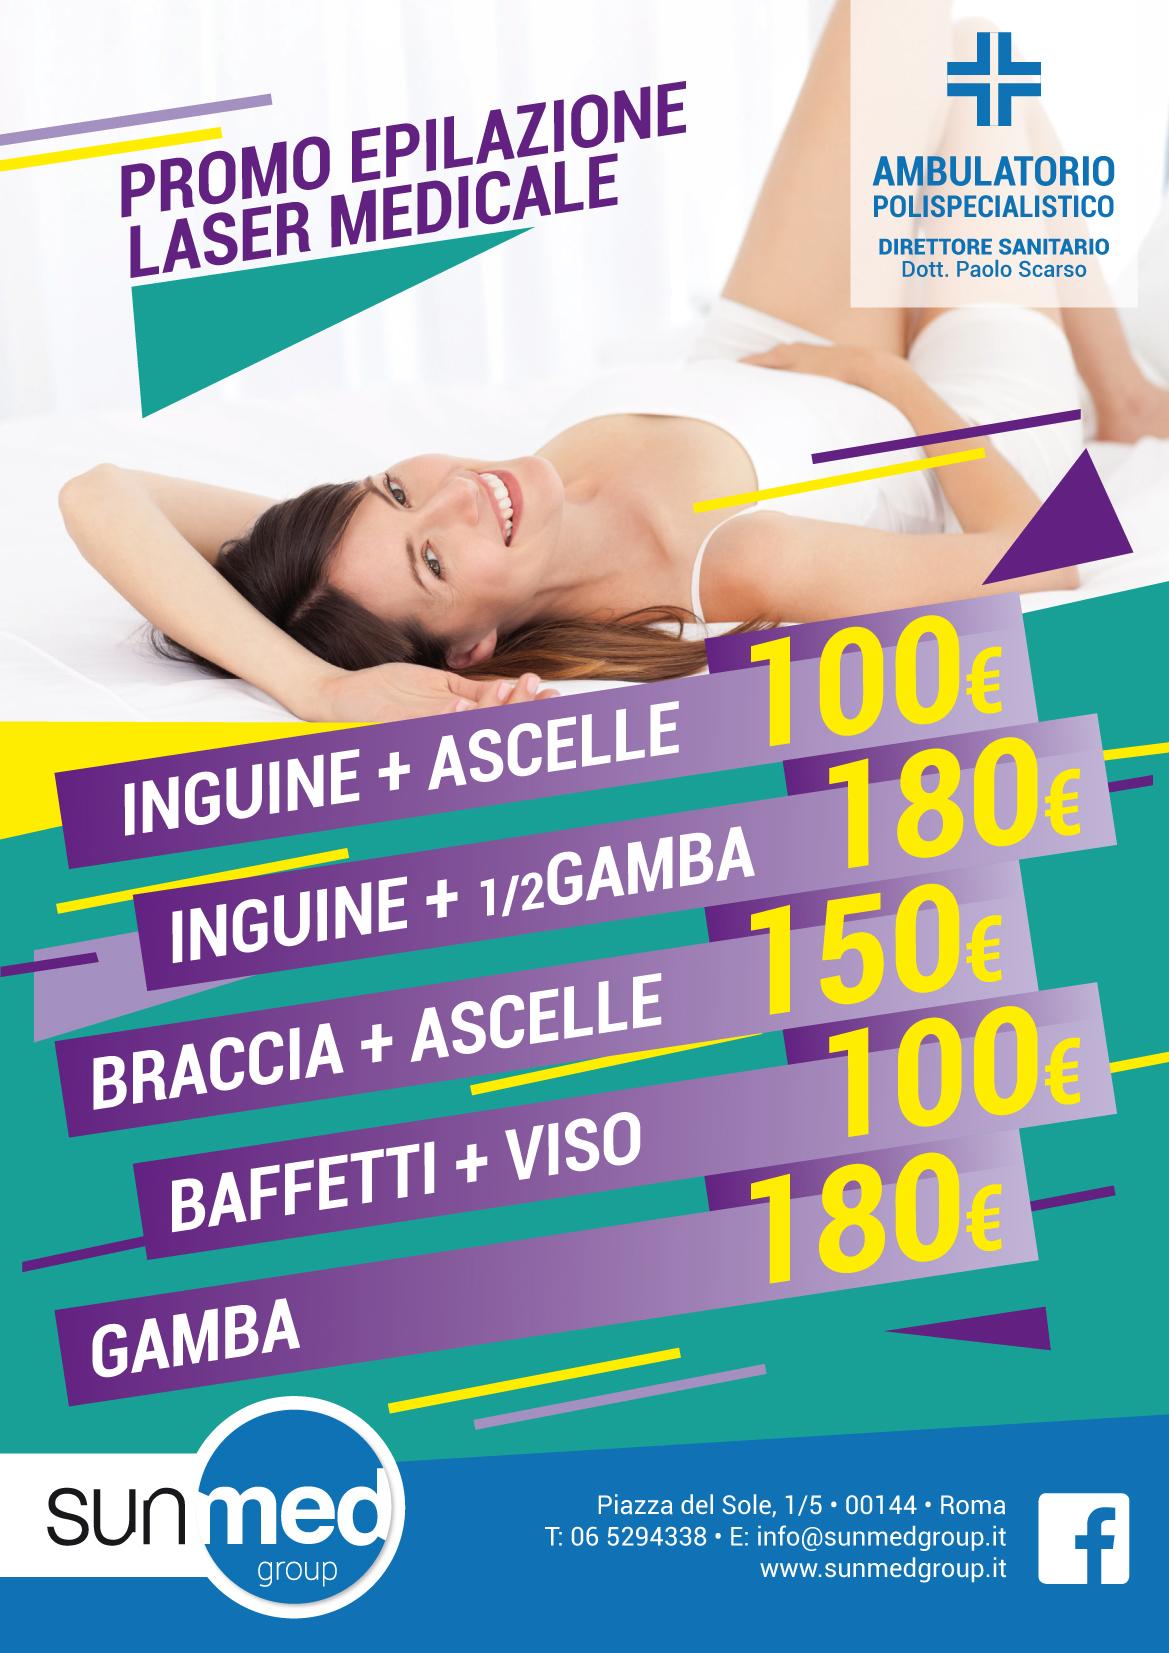 Offerta Epilazione Laser Medicale Roma EUR Torrino